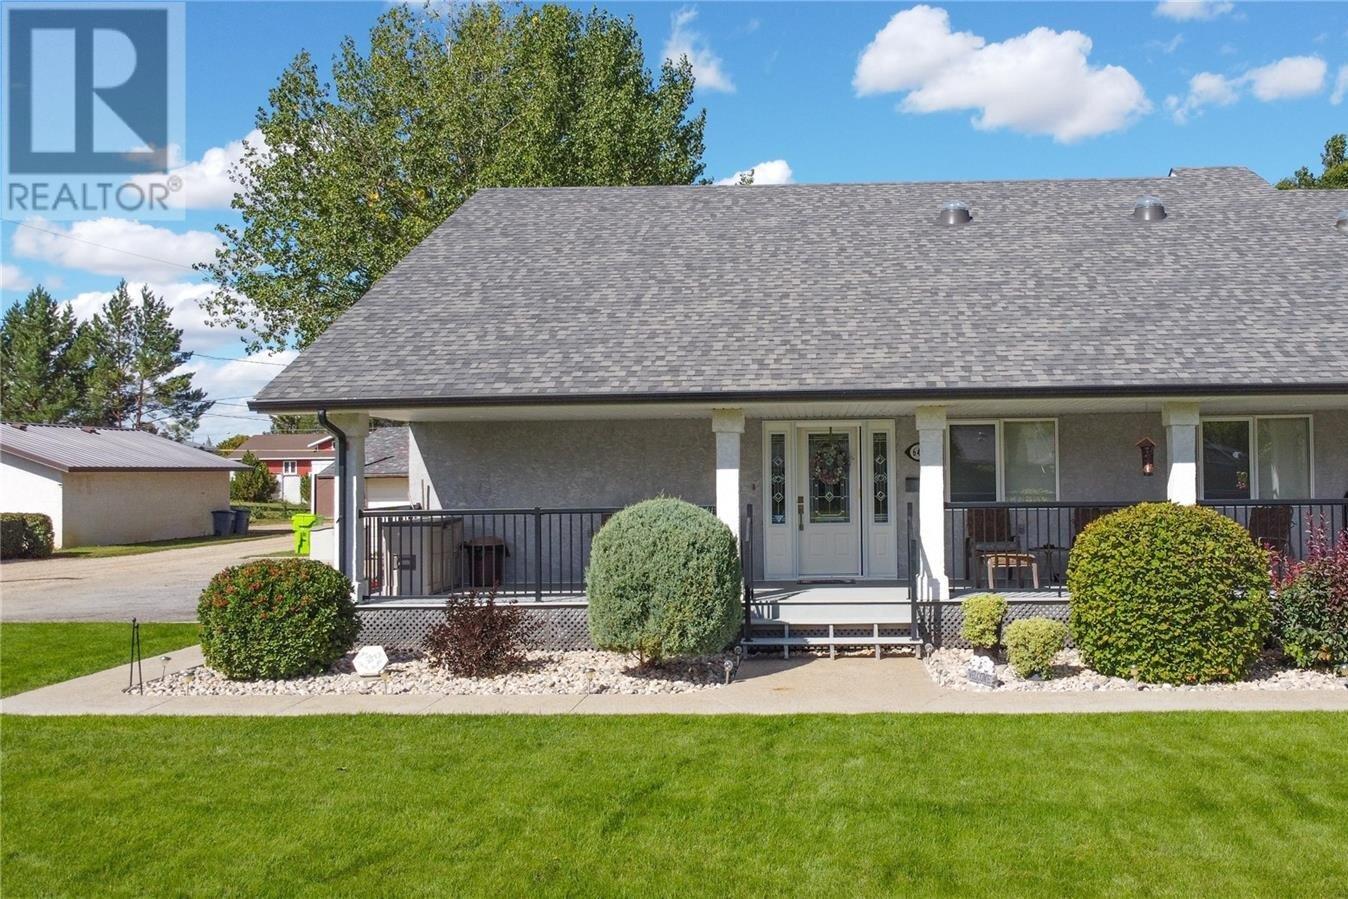 House for sale at 644 Segwun Ave S Unit 1 Fort Qu'appelle Saskatchewan - MLS: SK825982